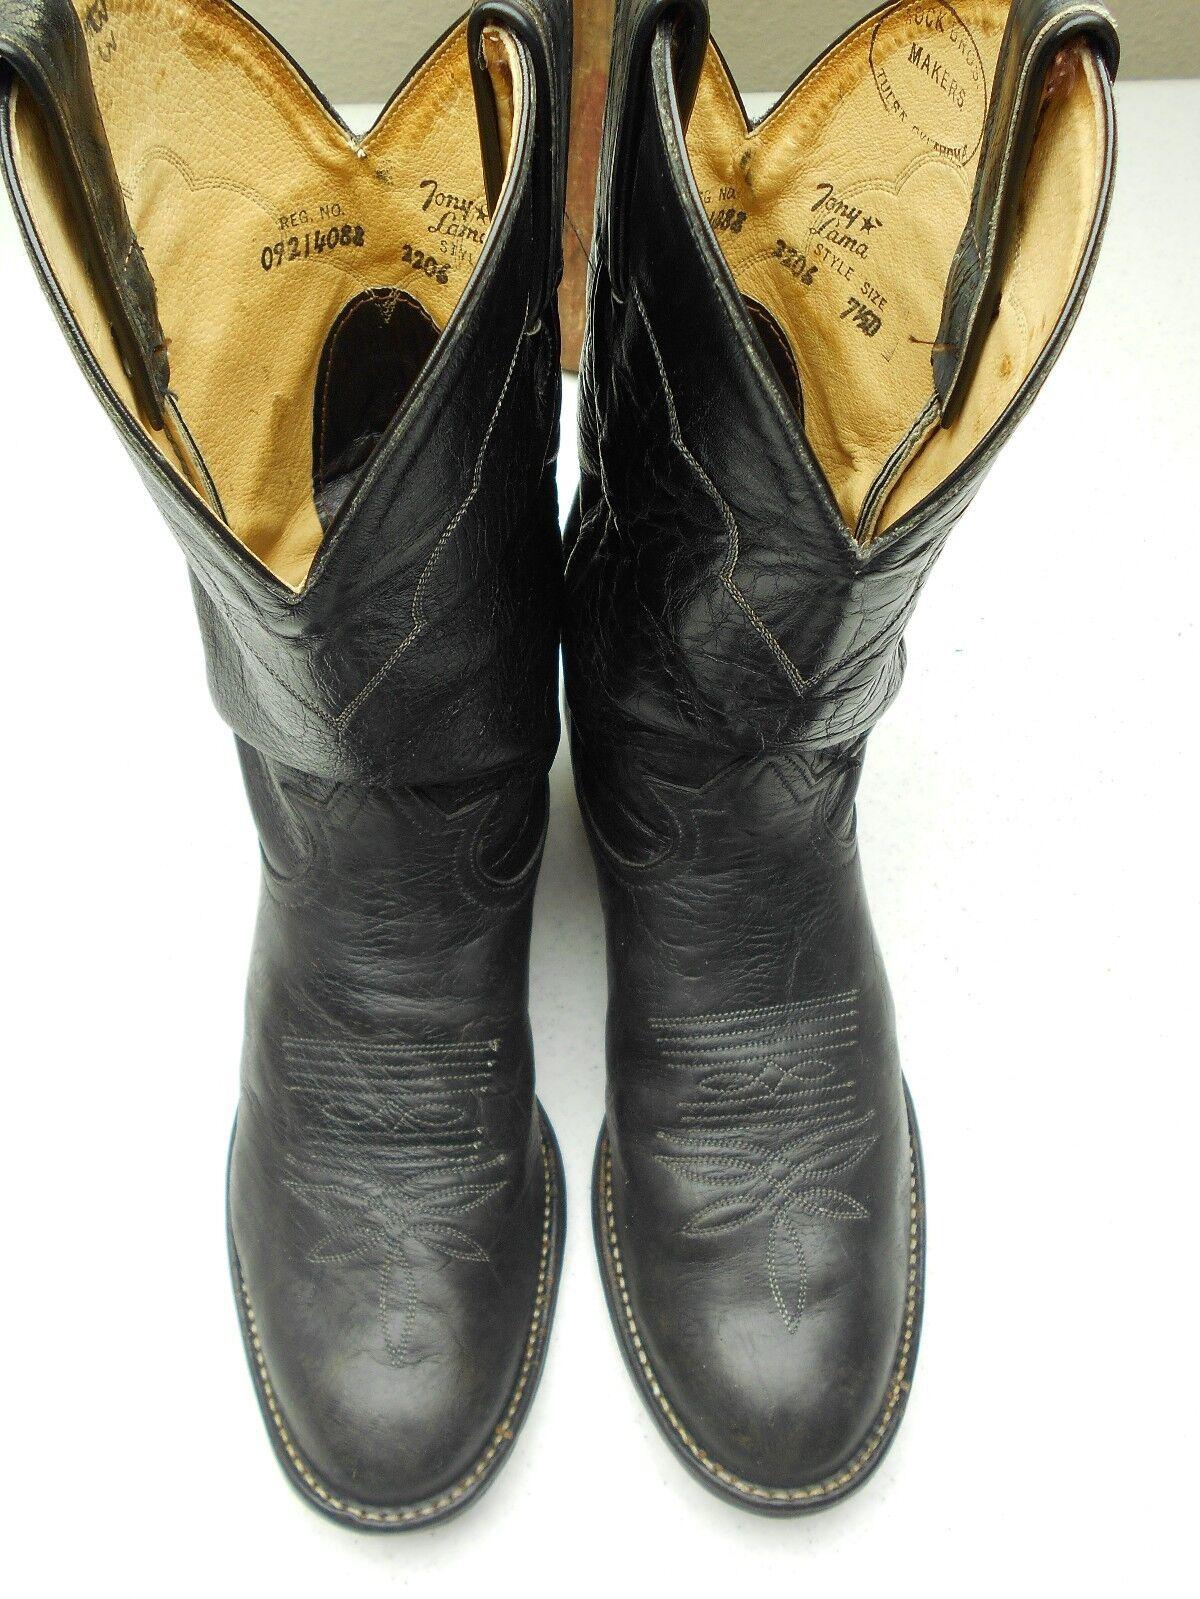 TULSA oklahoma DARK PEWTER grau TONY TONY TONY LAMA ROUND TOE WESTERN COWBOY Stiefel 7.5 M a5cf80